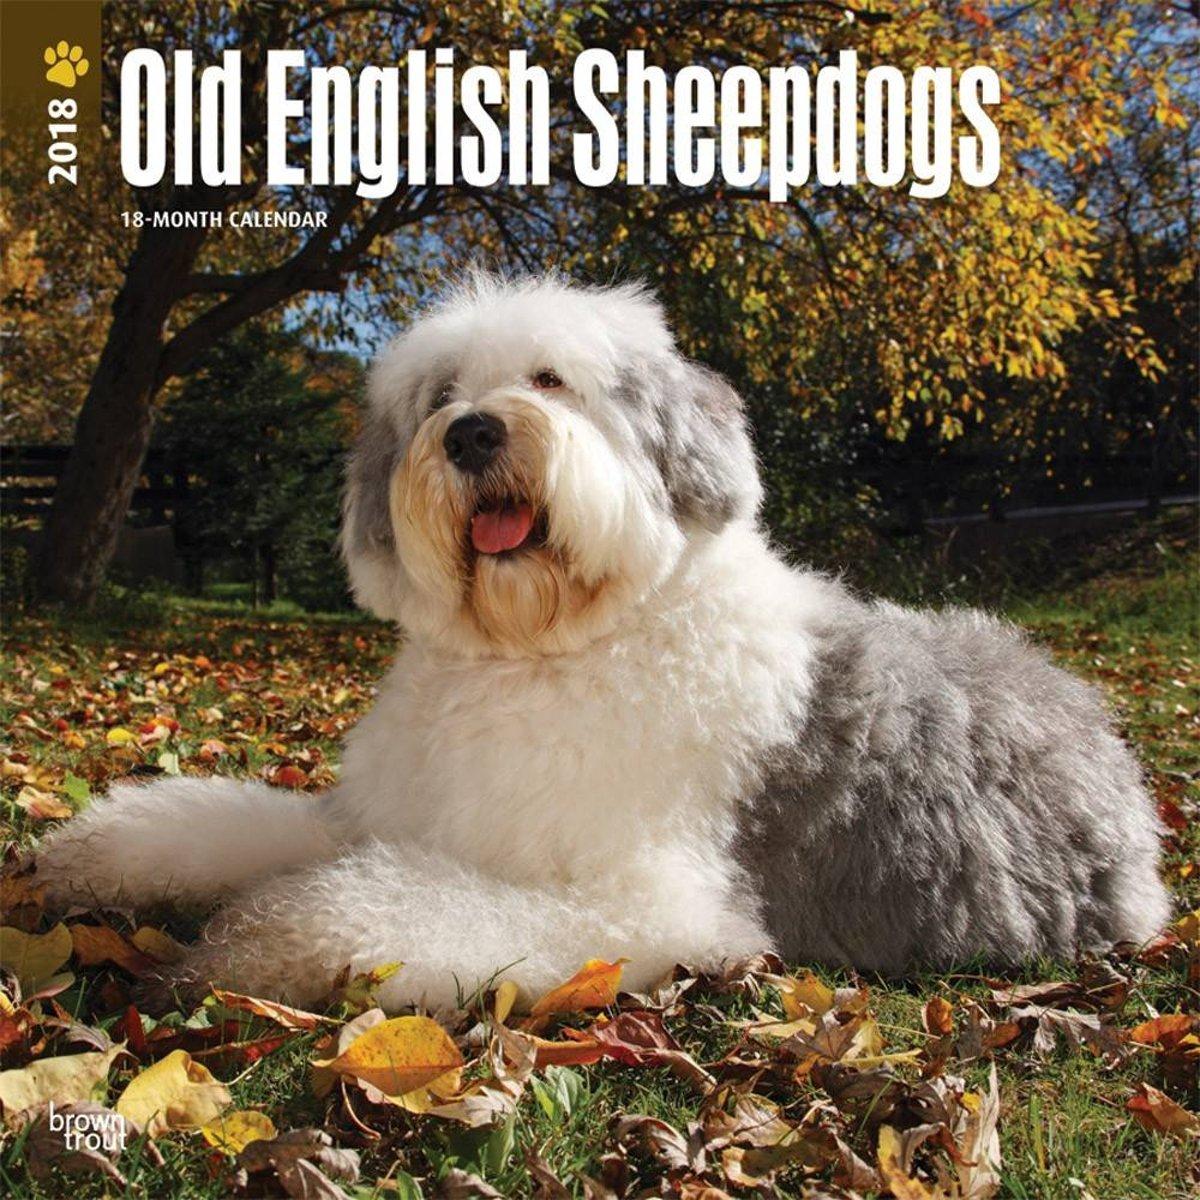 Old English Sheepdog Calendar 2019